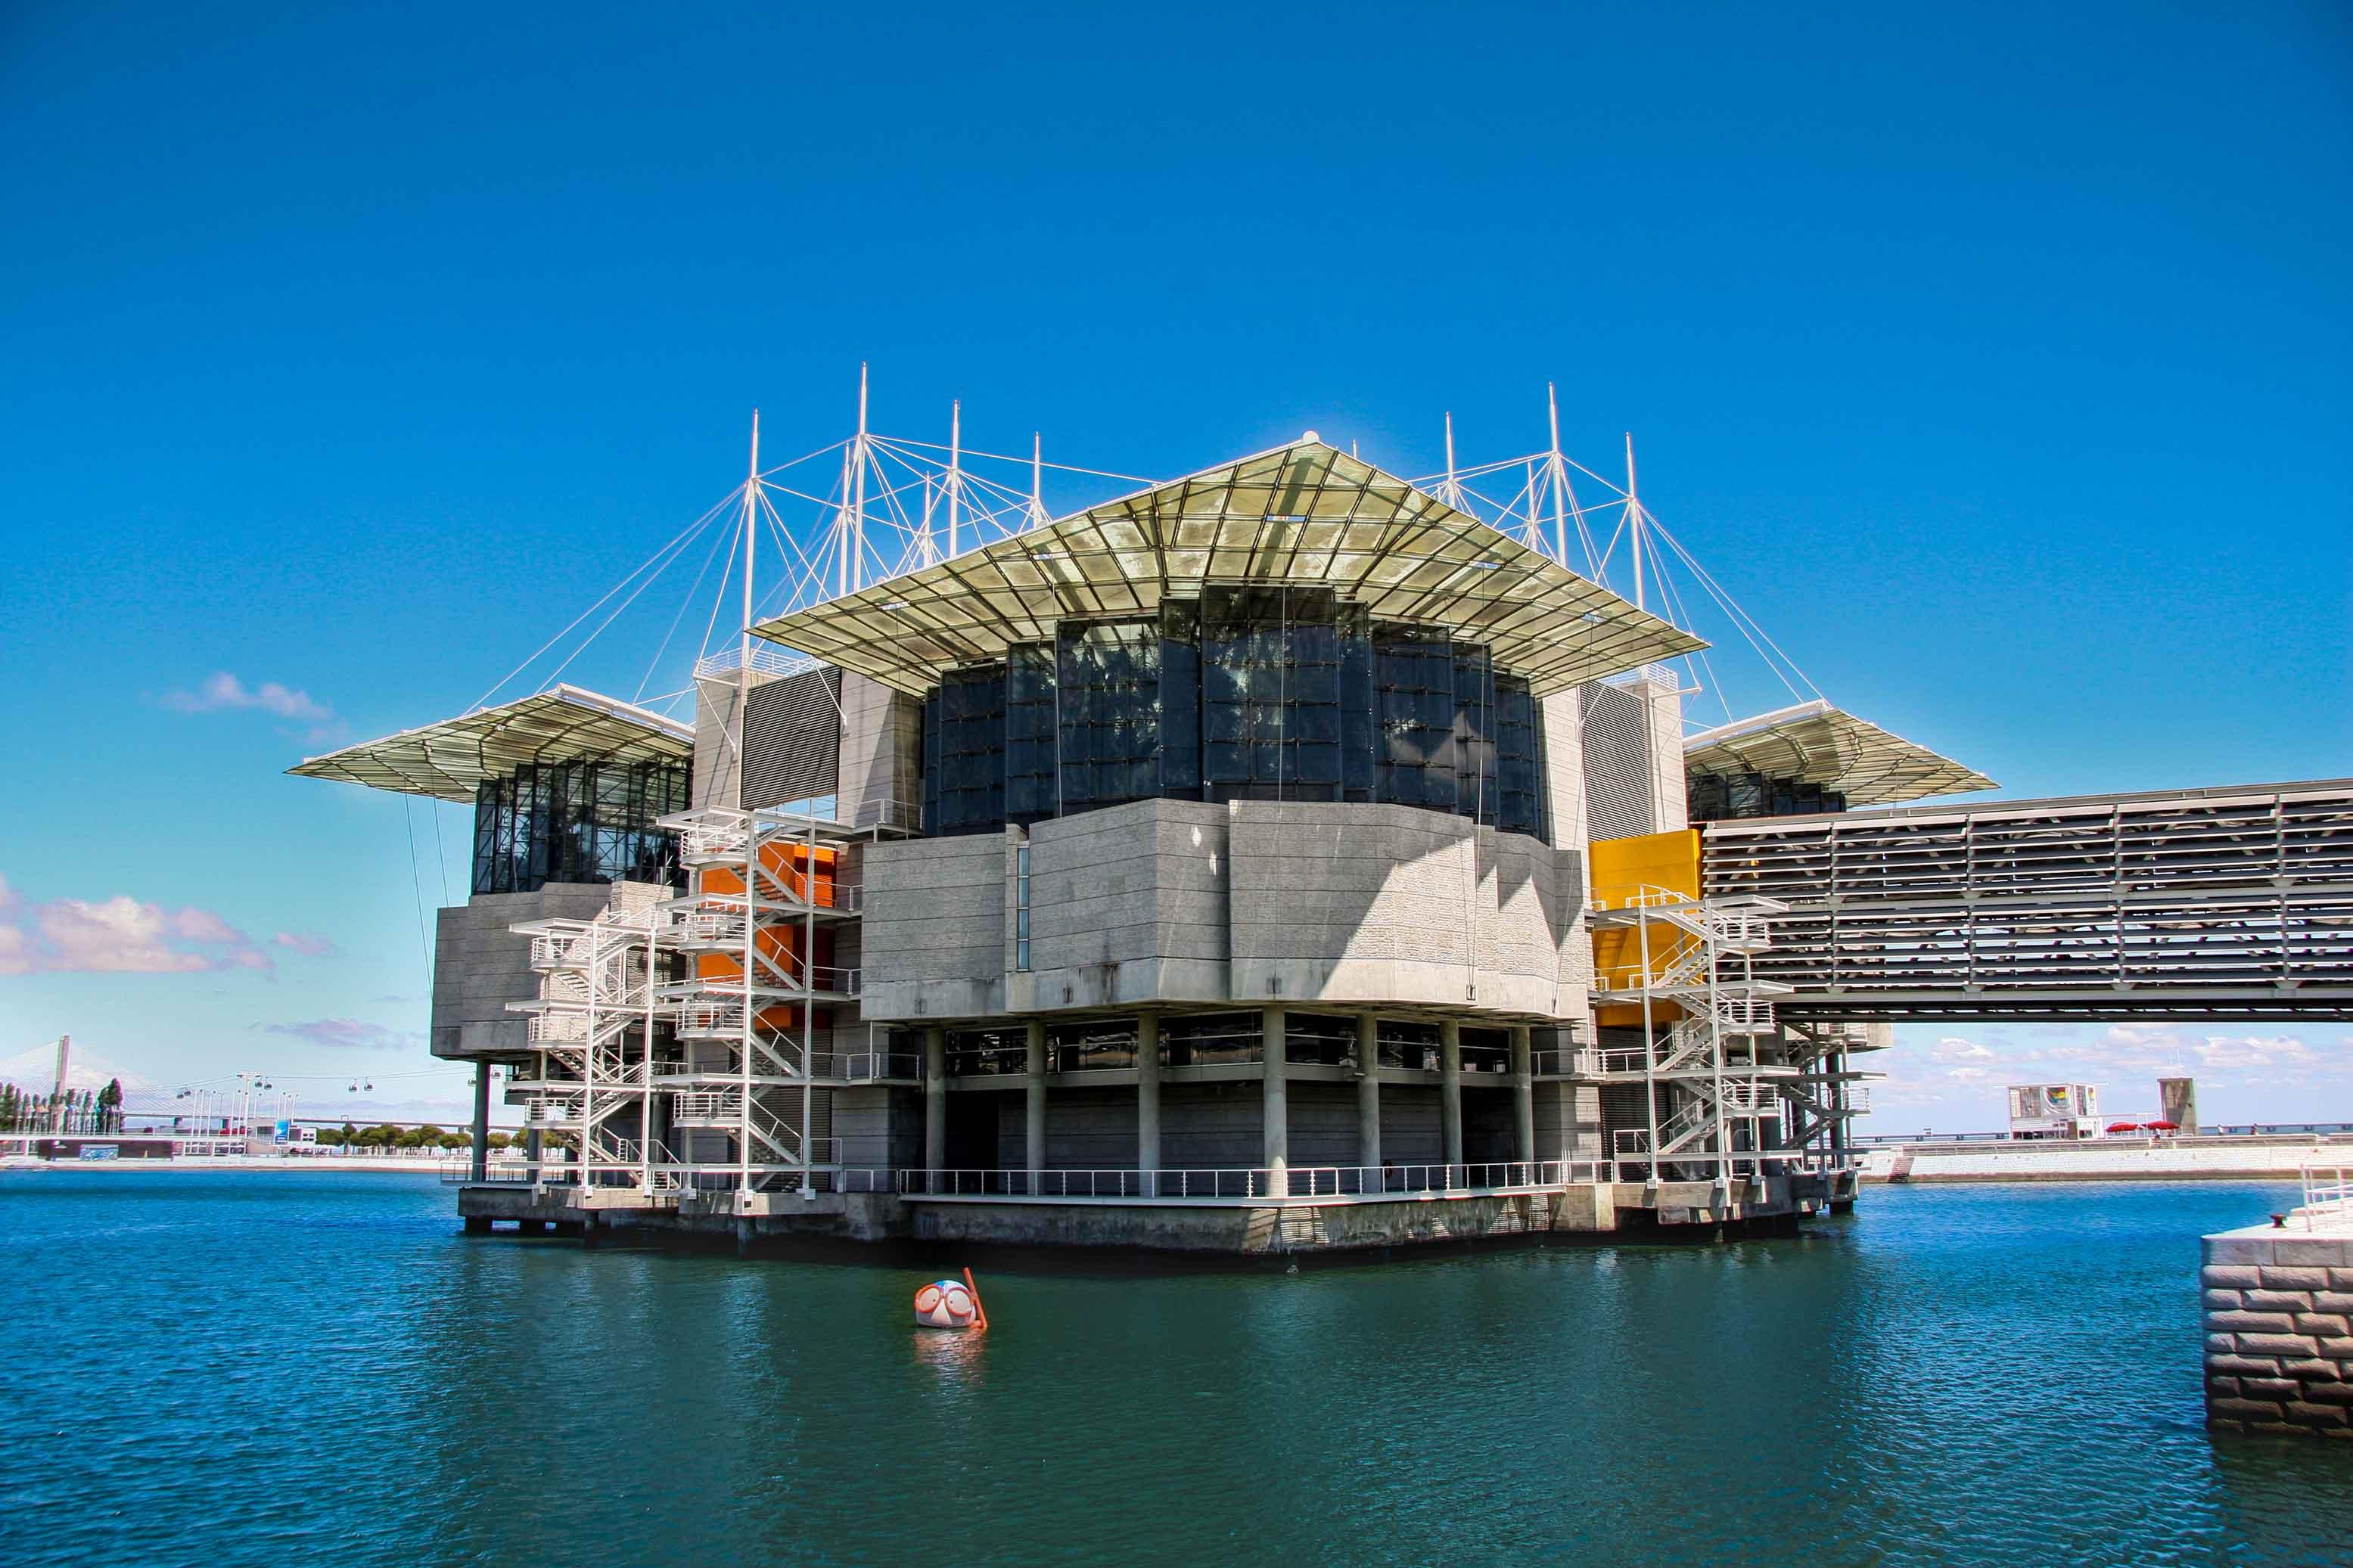 Portugal's Best Architecture Projects architecture Portugal's Best Architecture Projects Lisbon   s Aquariums 2